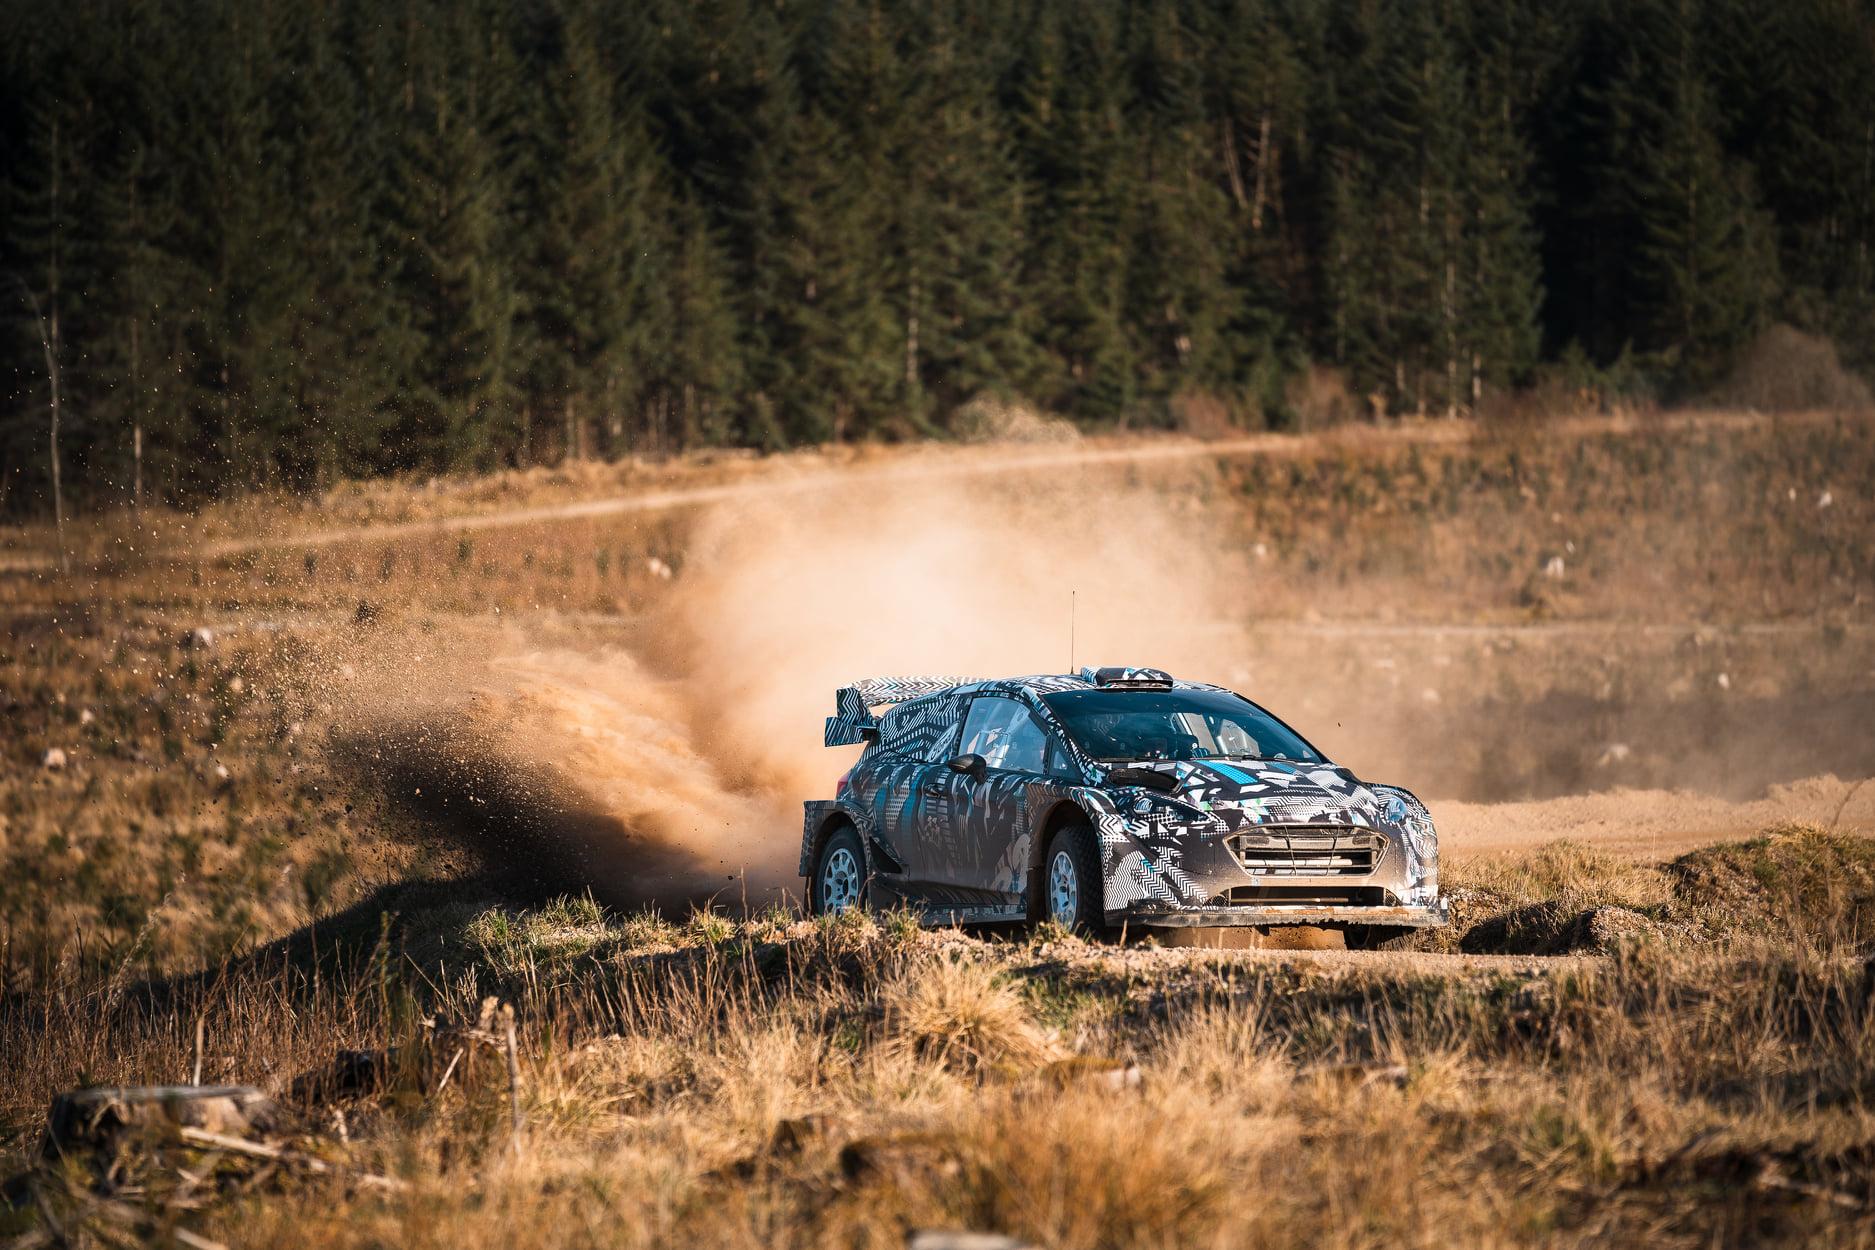 WRC: Το 2022 «έρχεται» πιο νωρίς για το Ford Fiesta Rally 1 hybrid (video)